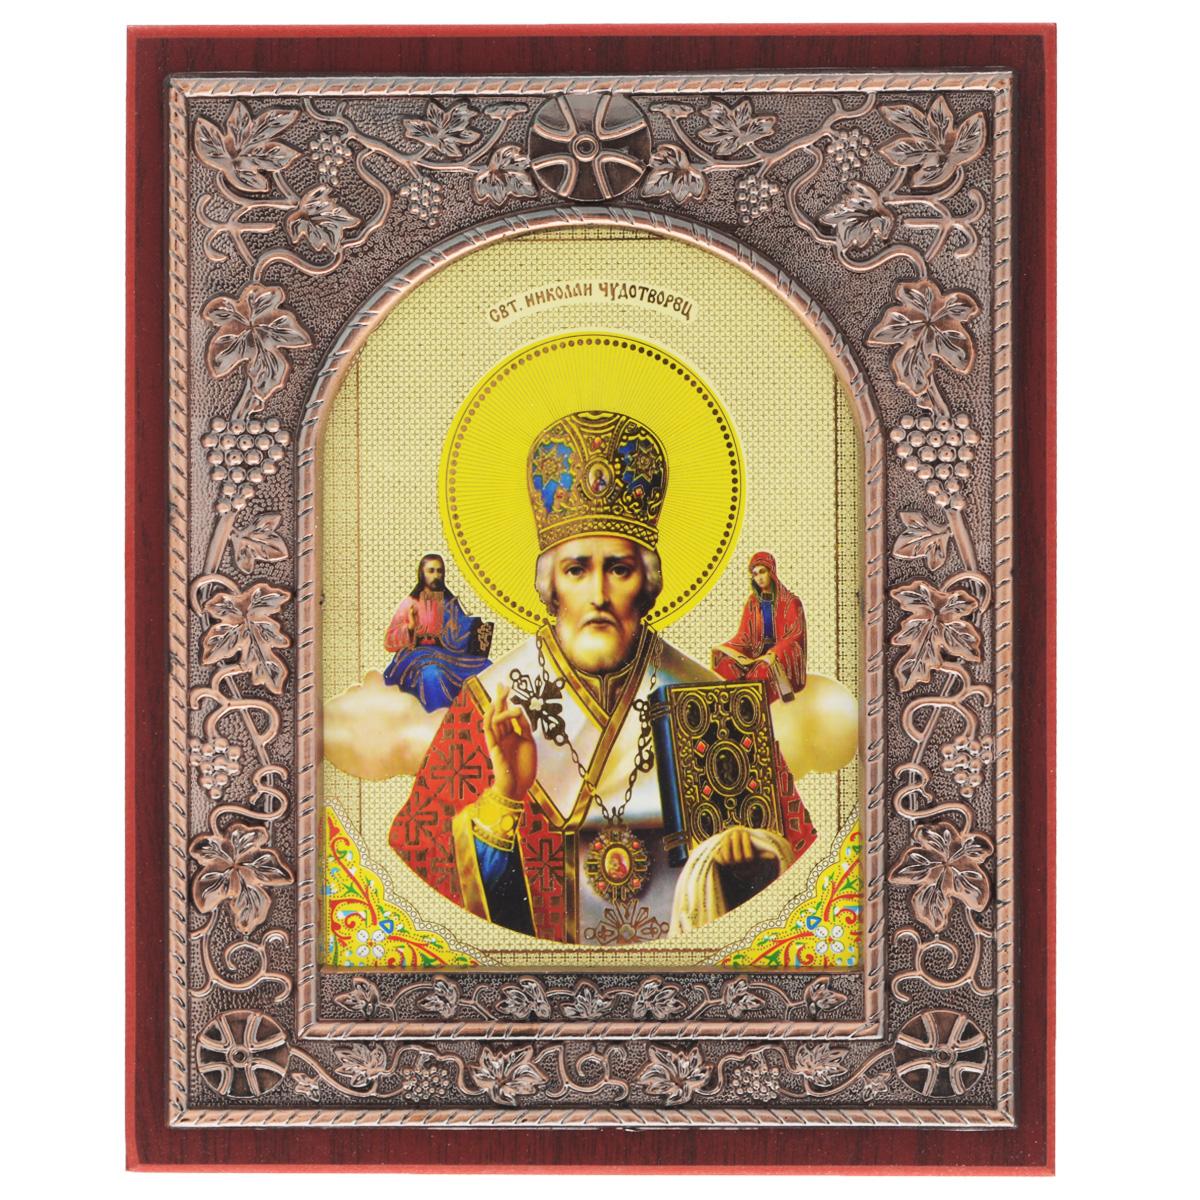 Икона в рамке Sima-land Святой Николай Чудотворец, 19 х 24 см